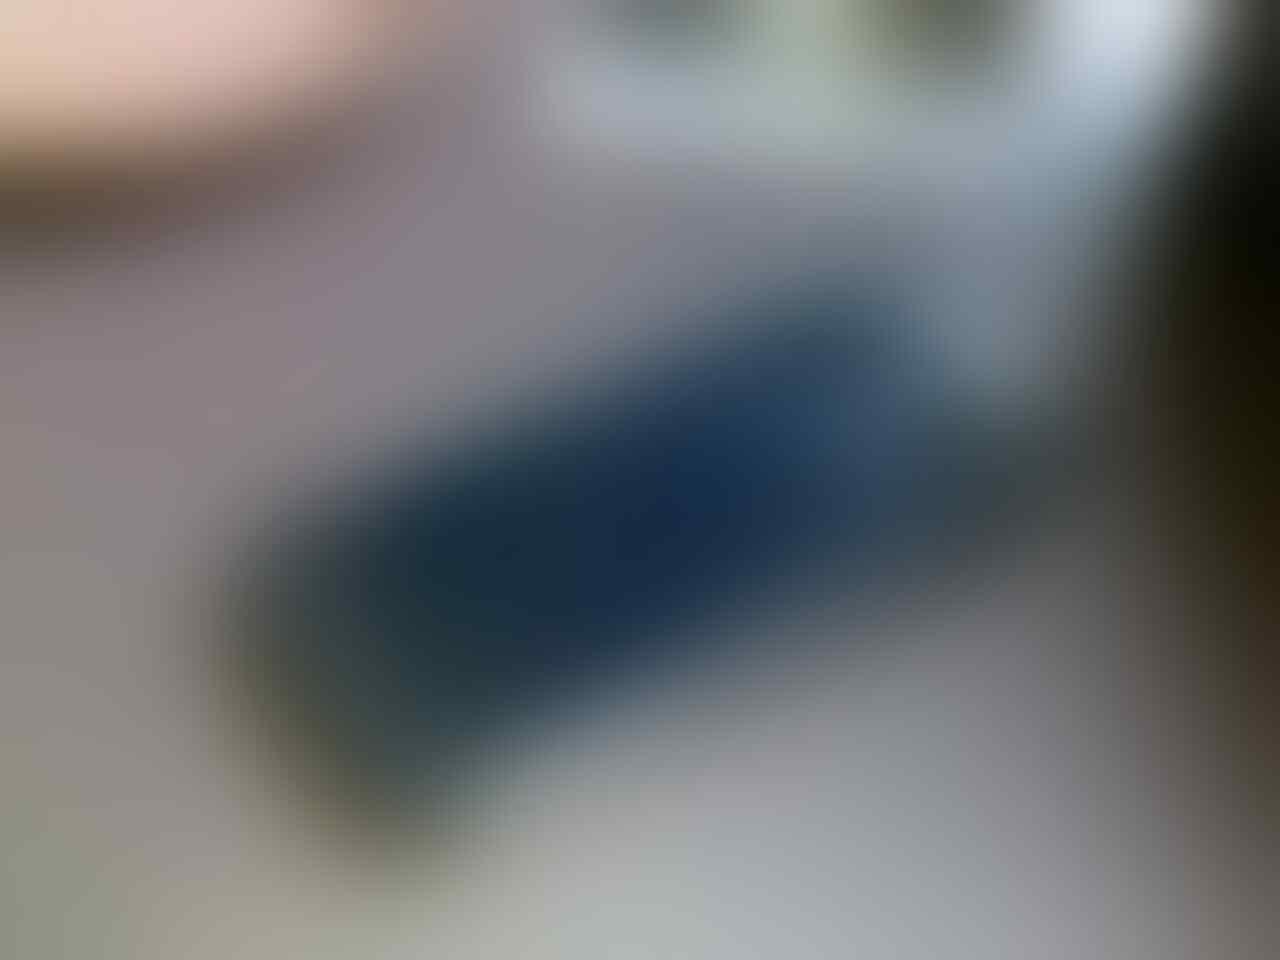 [WTS] Jual Santai Nokia ASHA 308 dual sim like new belum ada sebulan...